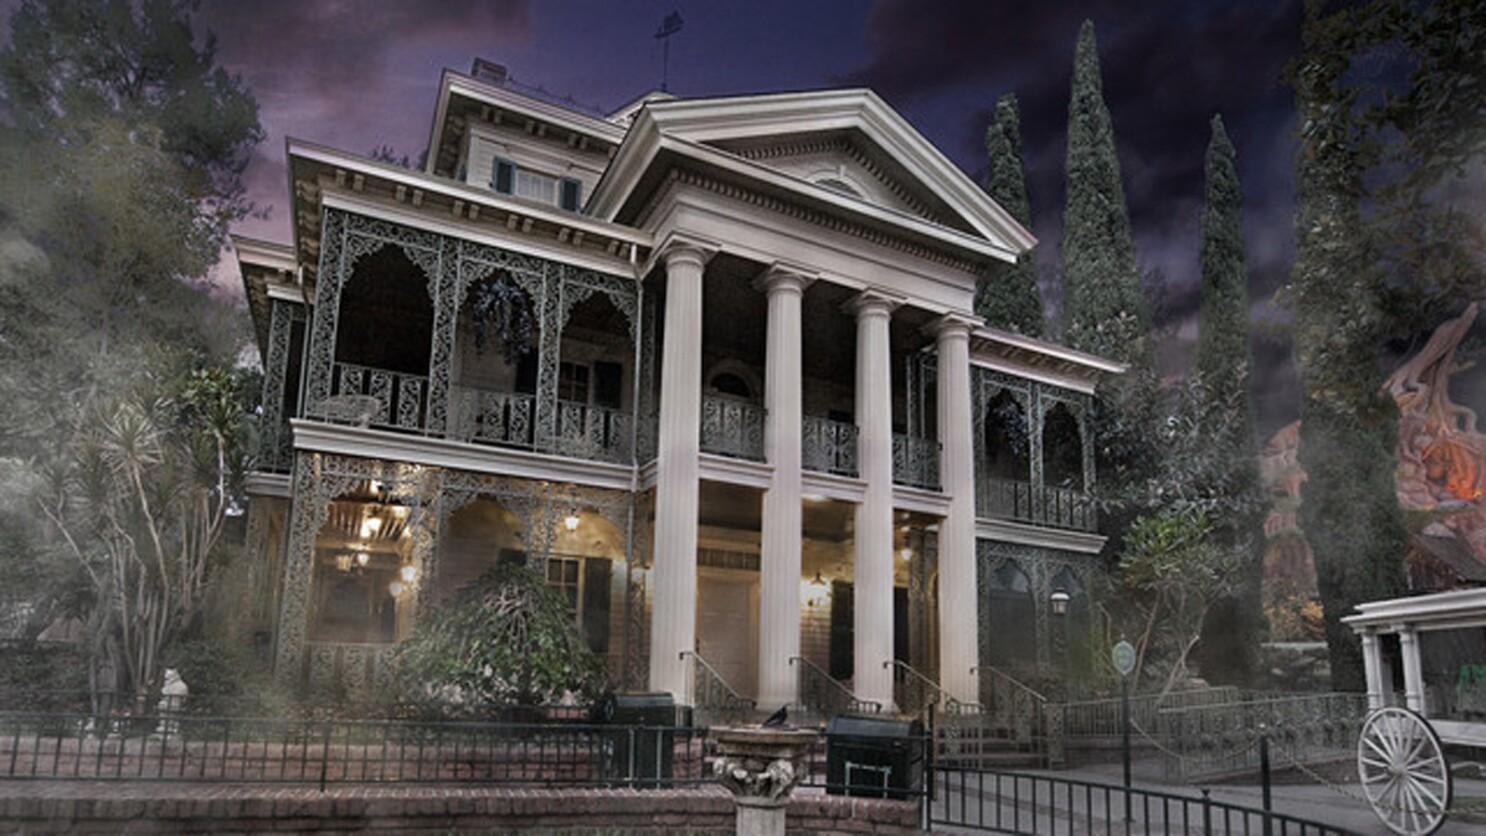 At Haunted Mansion 50th anniversary bash, Disneyland stays weird